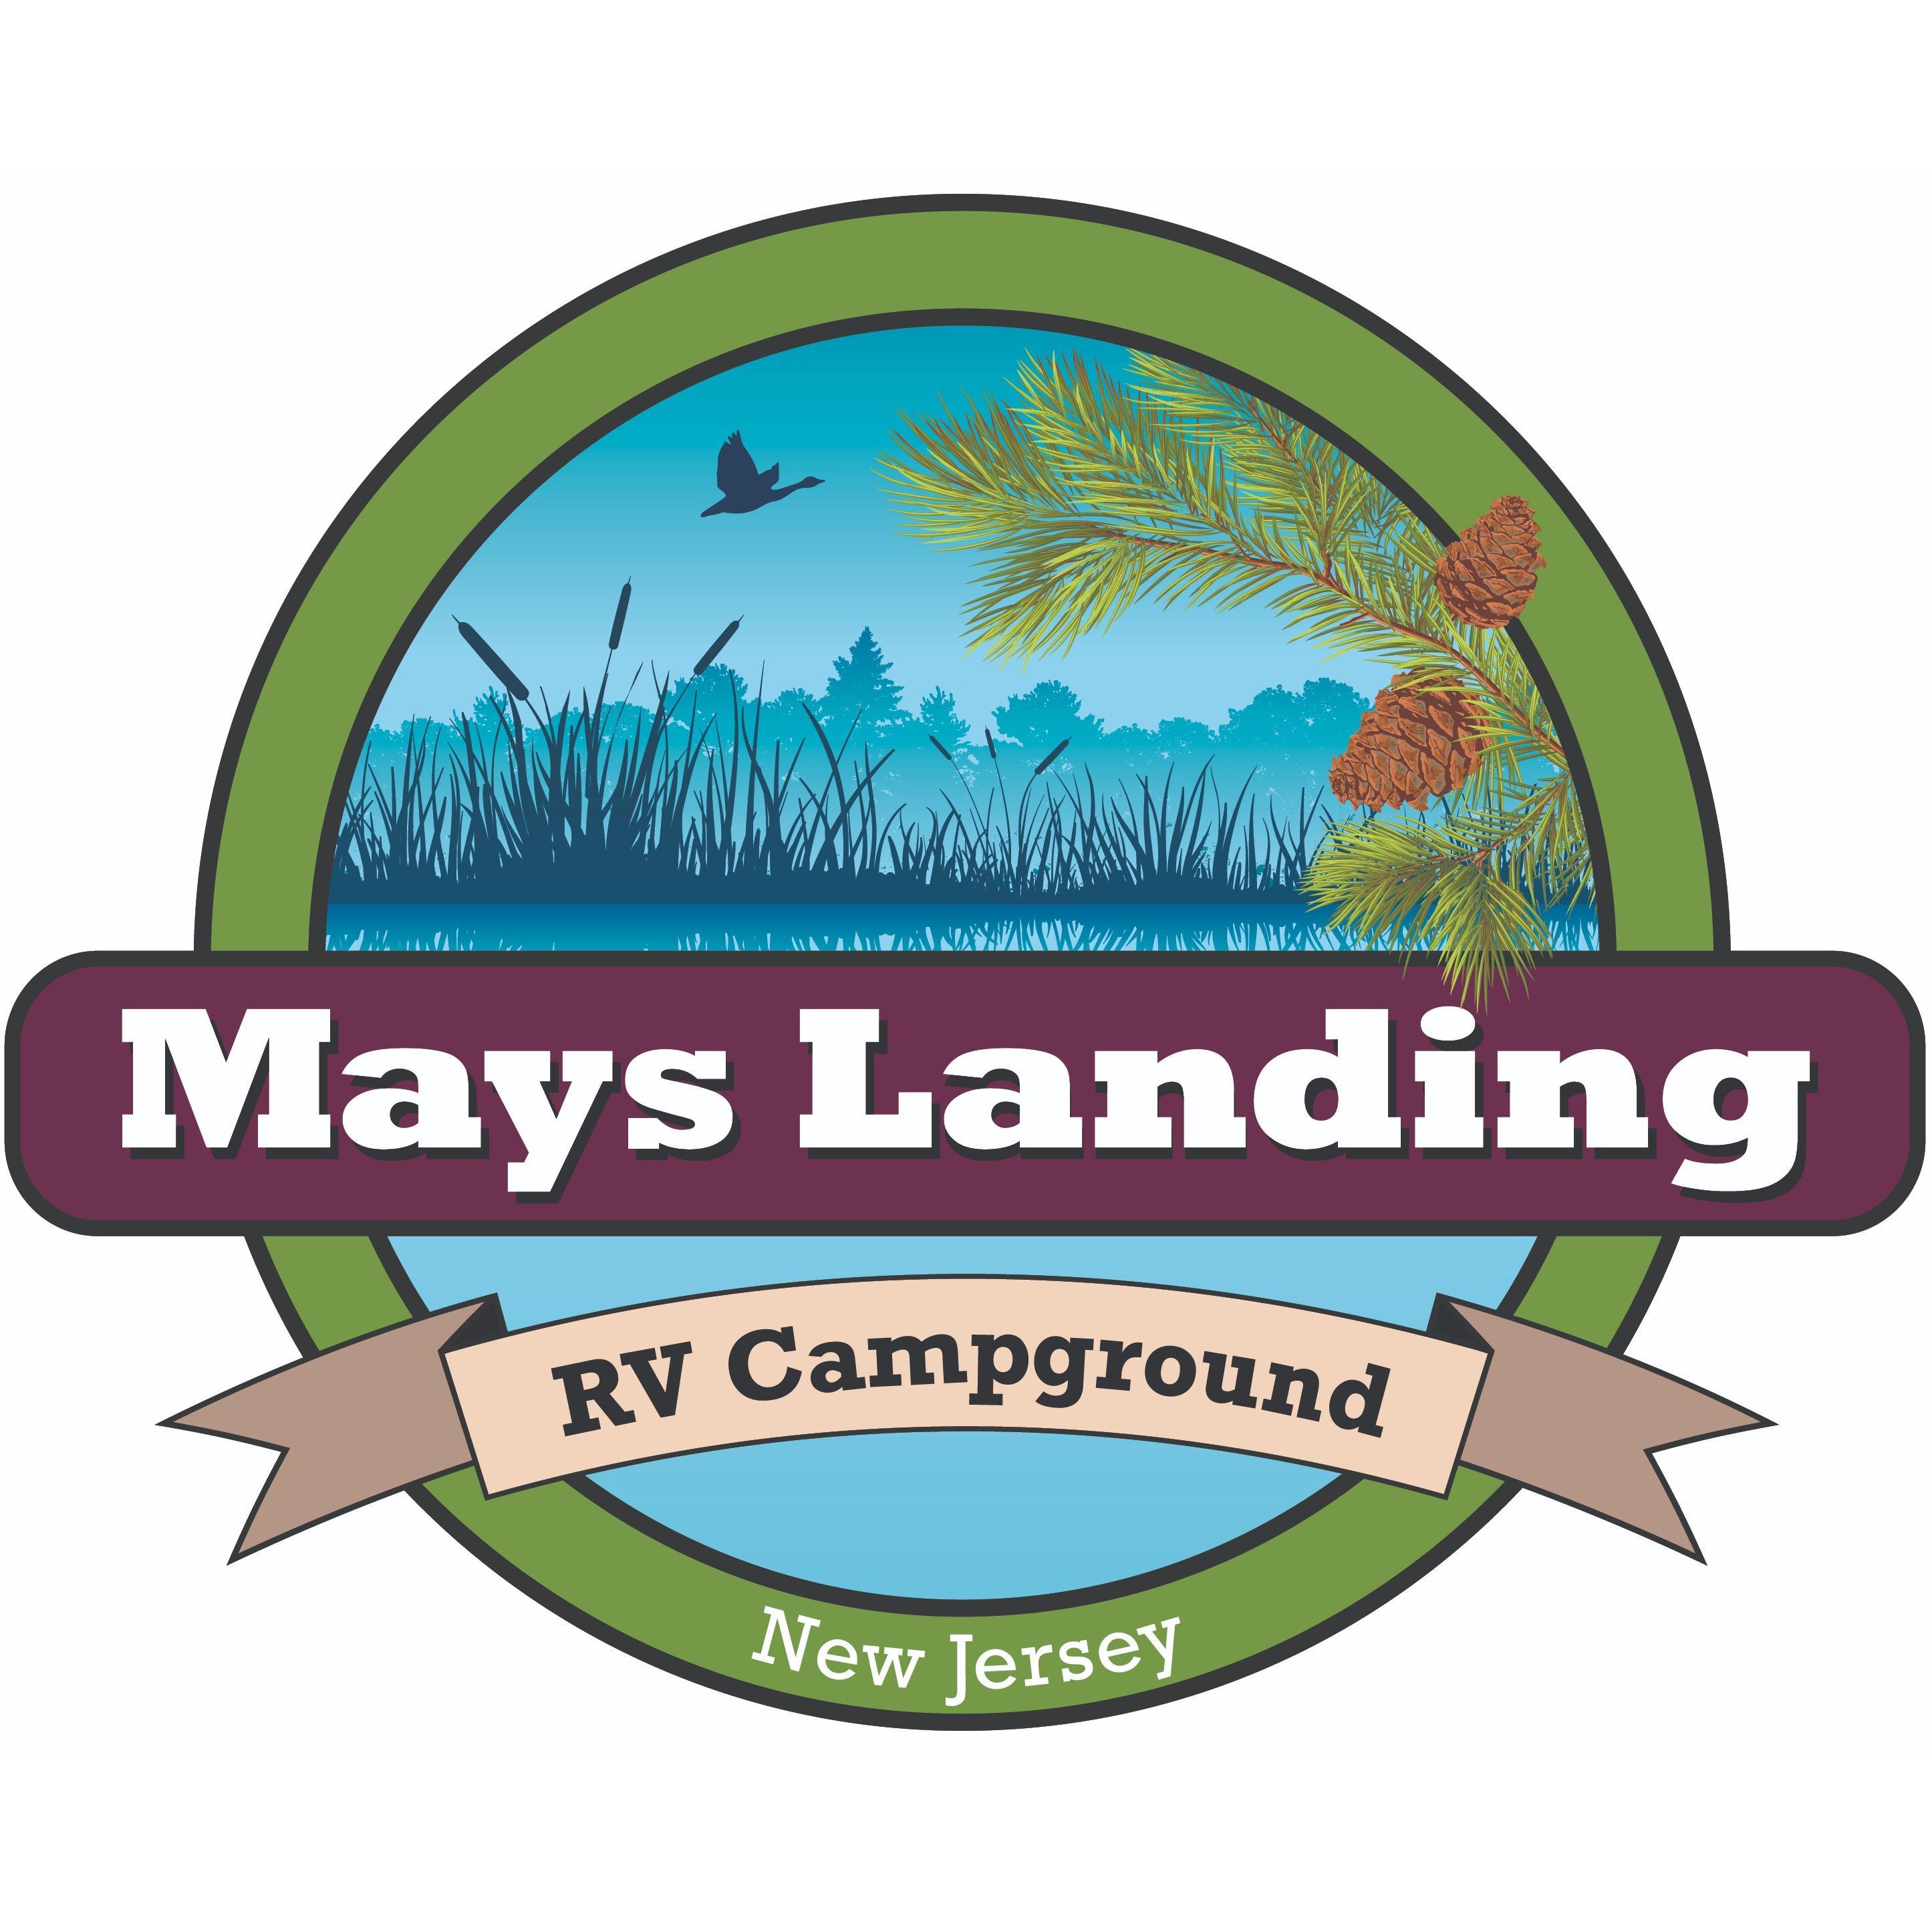 Mays Landing Campground